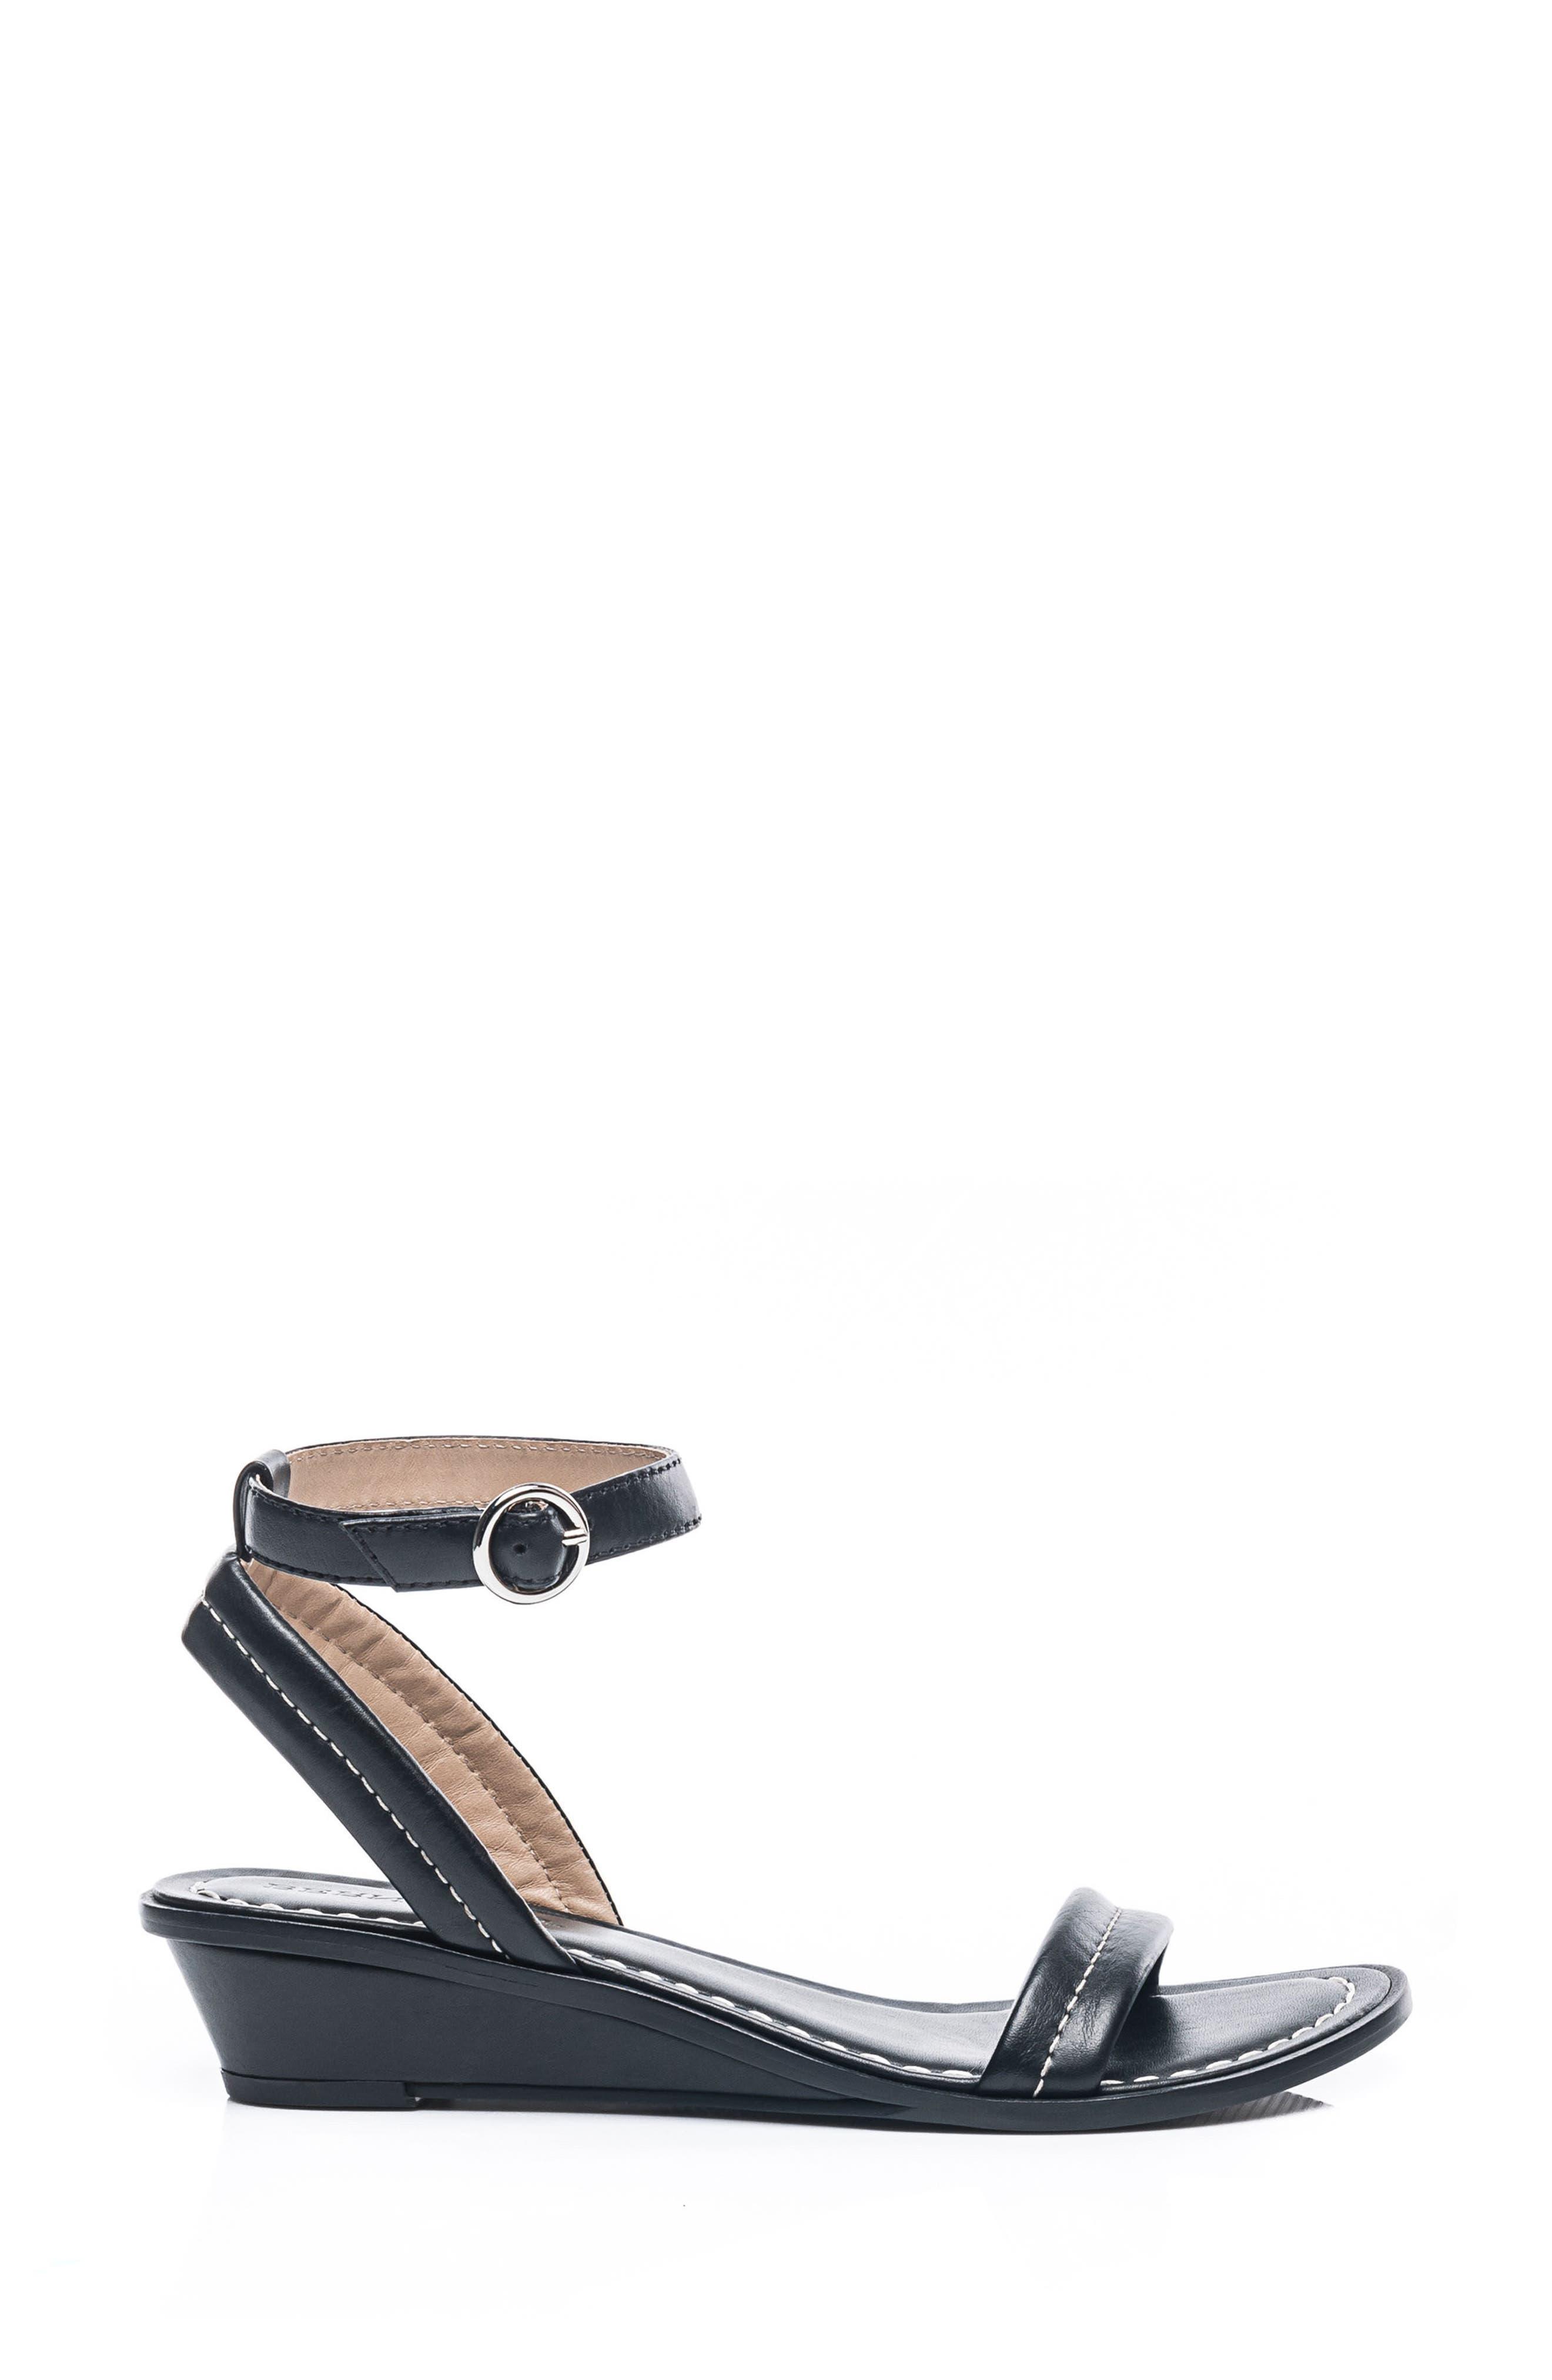 Bernardo Catherine Ankle Strap Sandal,                             Alternate thumbnail 3, color,                             BLACK ANTIQUE